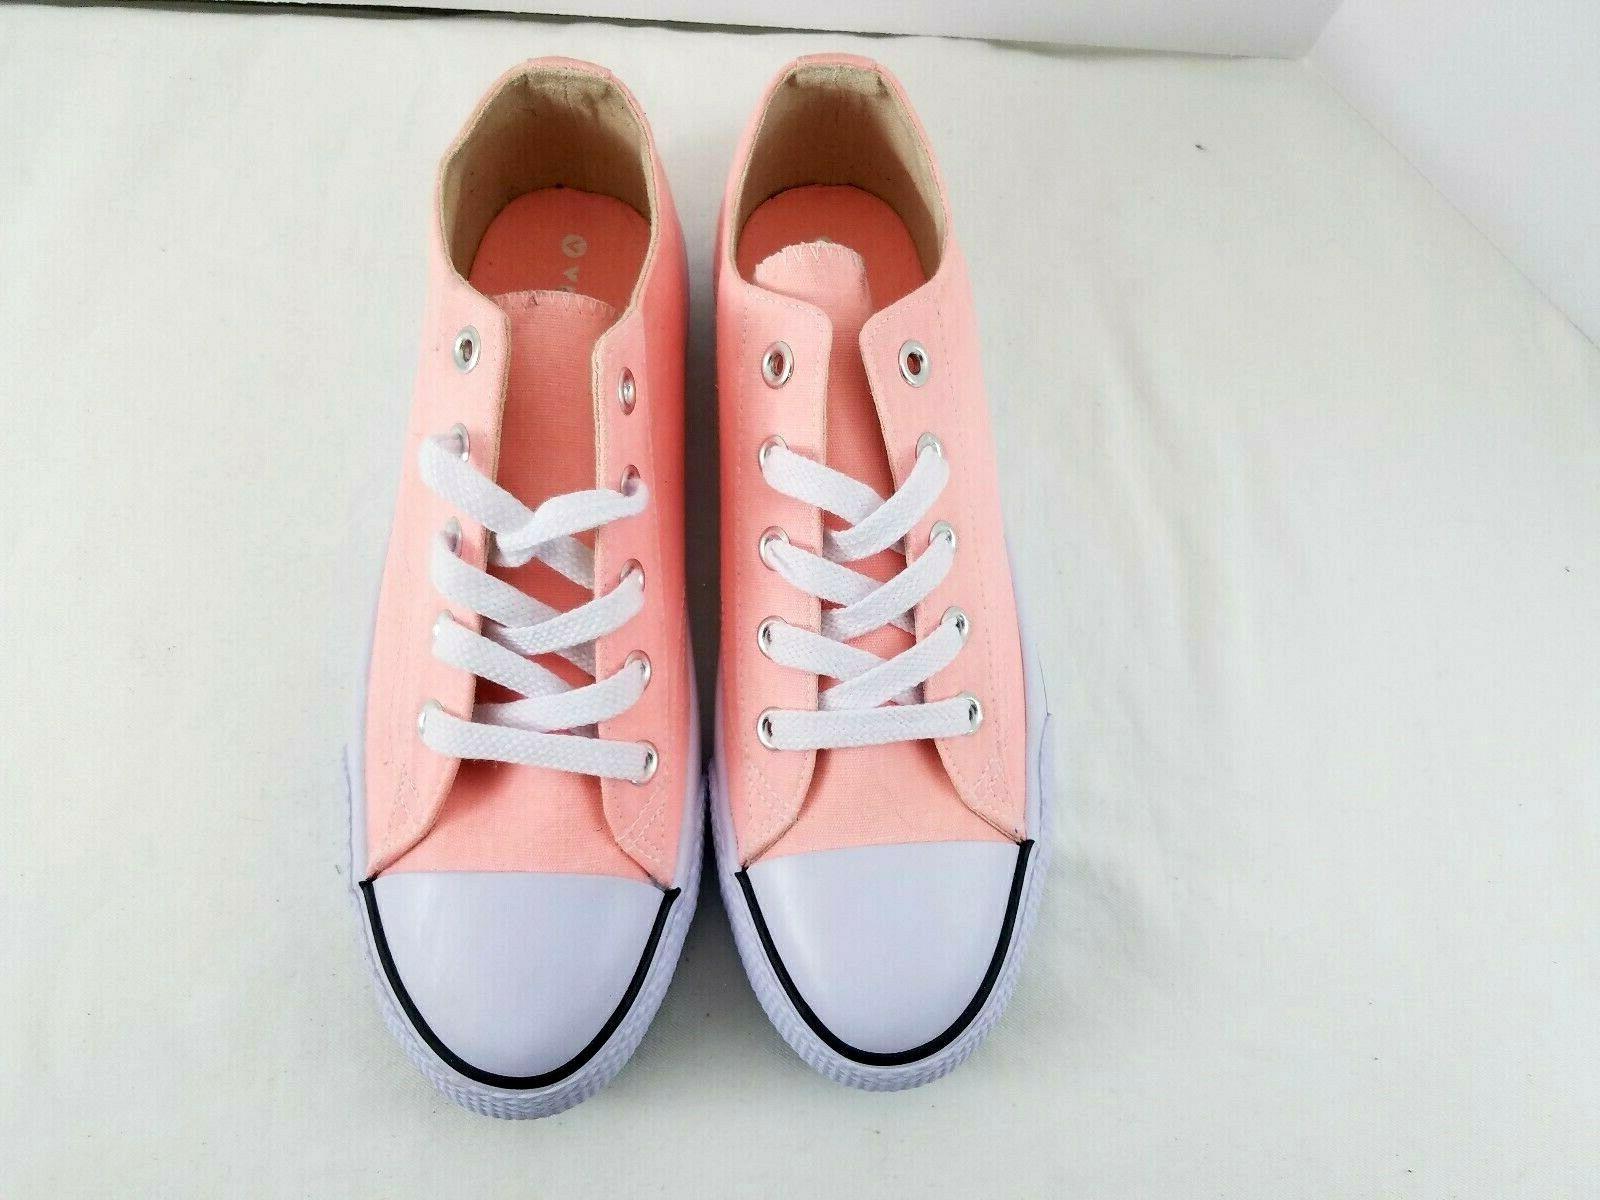 Airwalk Pink Sneakers Pink White multiple sizes New